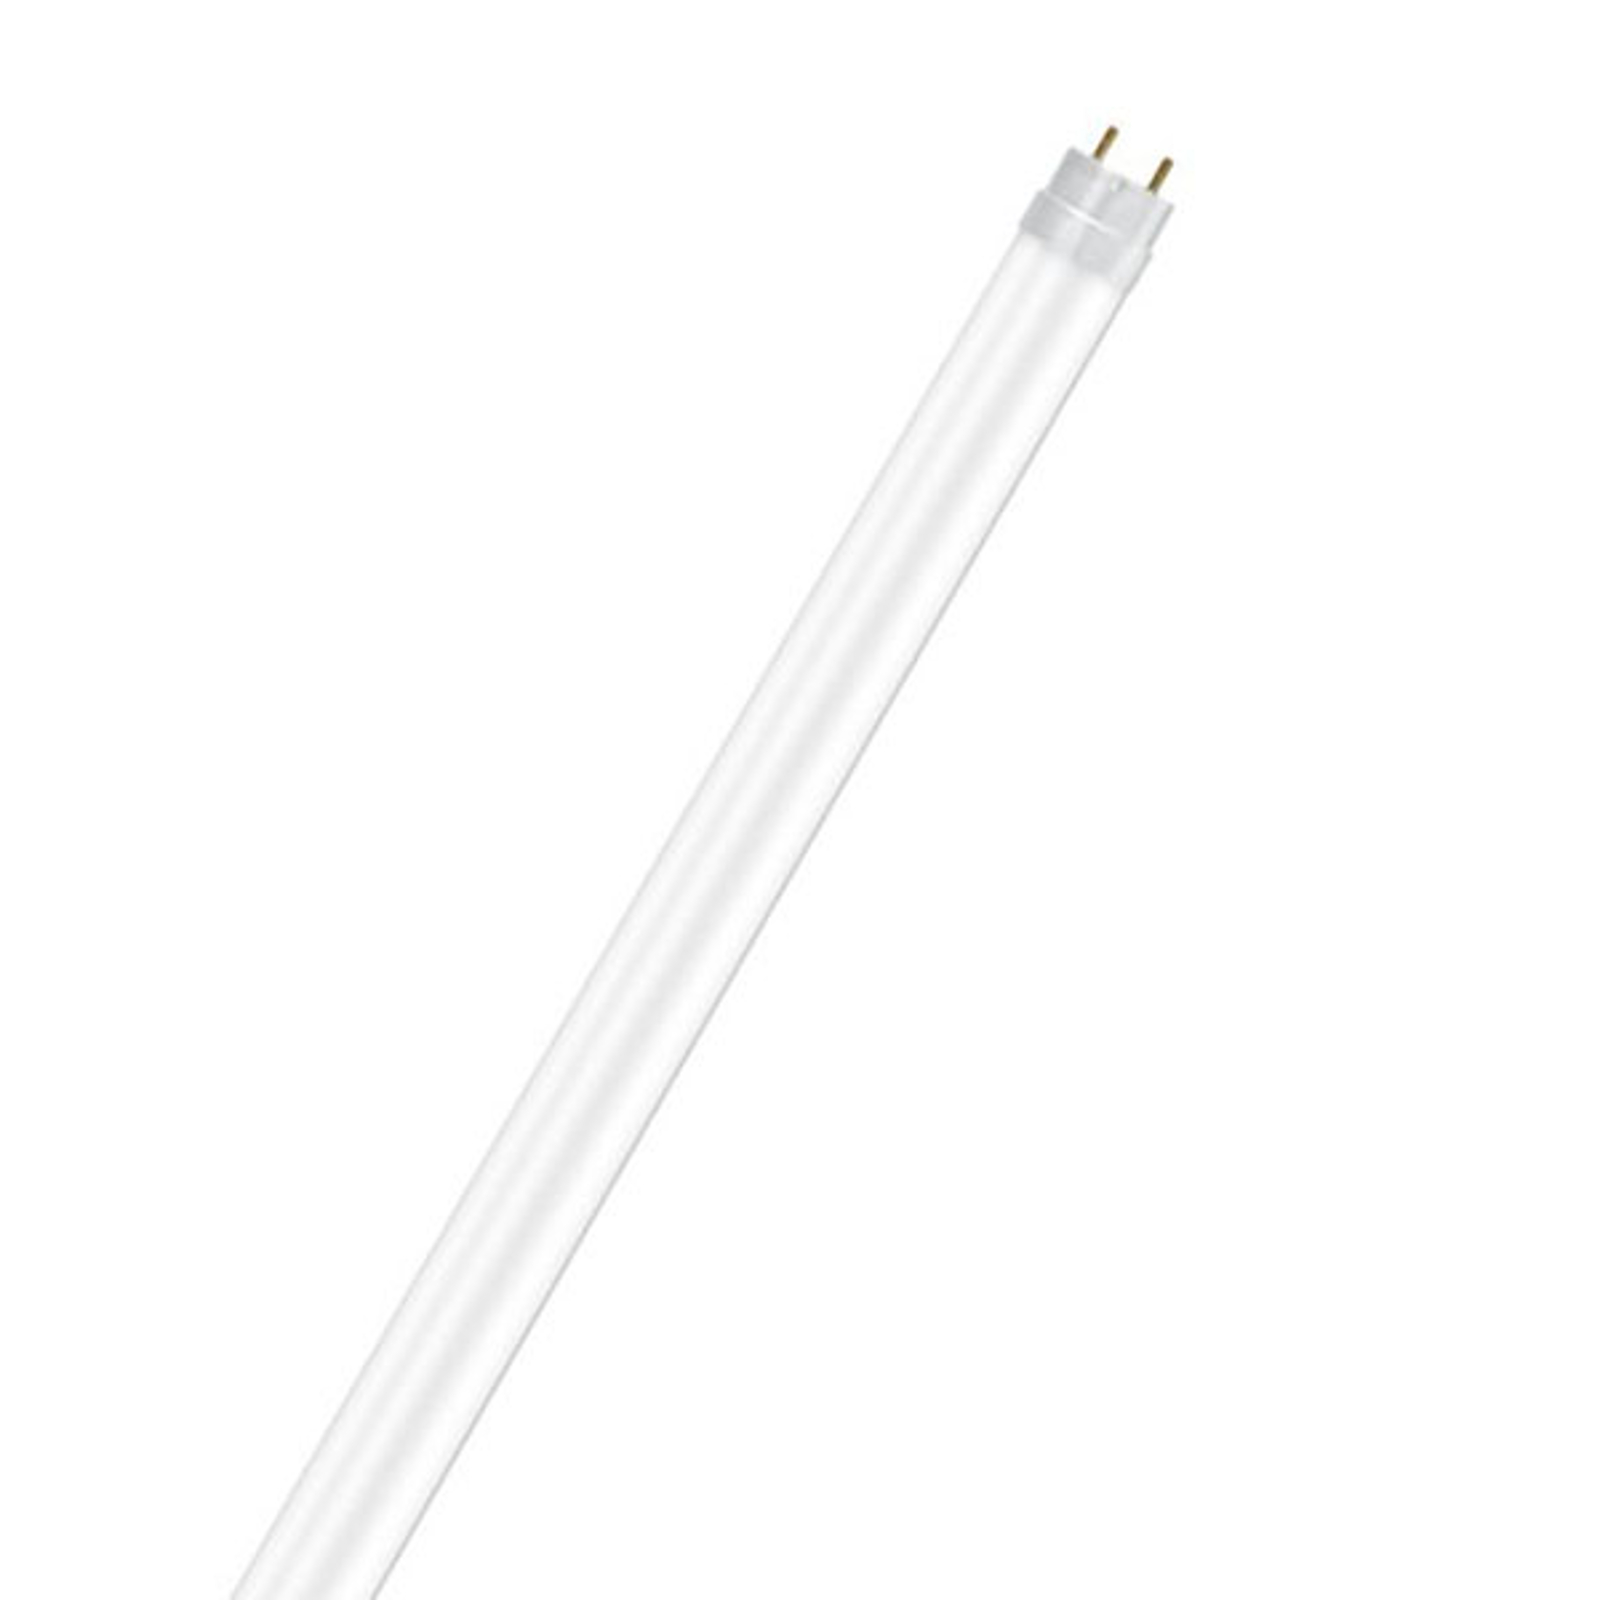 OSRAM-LED-putki G13 60cm SubstiTUBE 7,3W 6 500 K